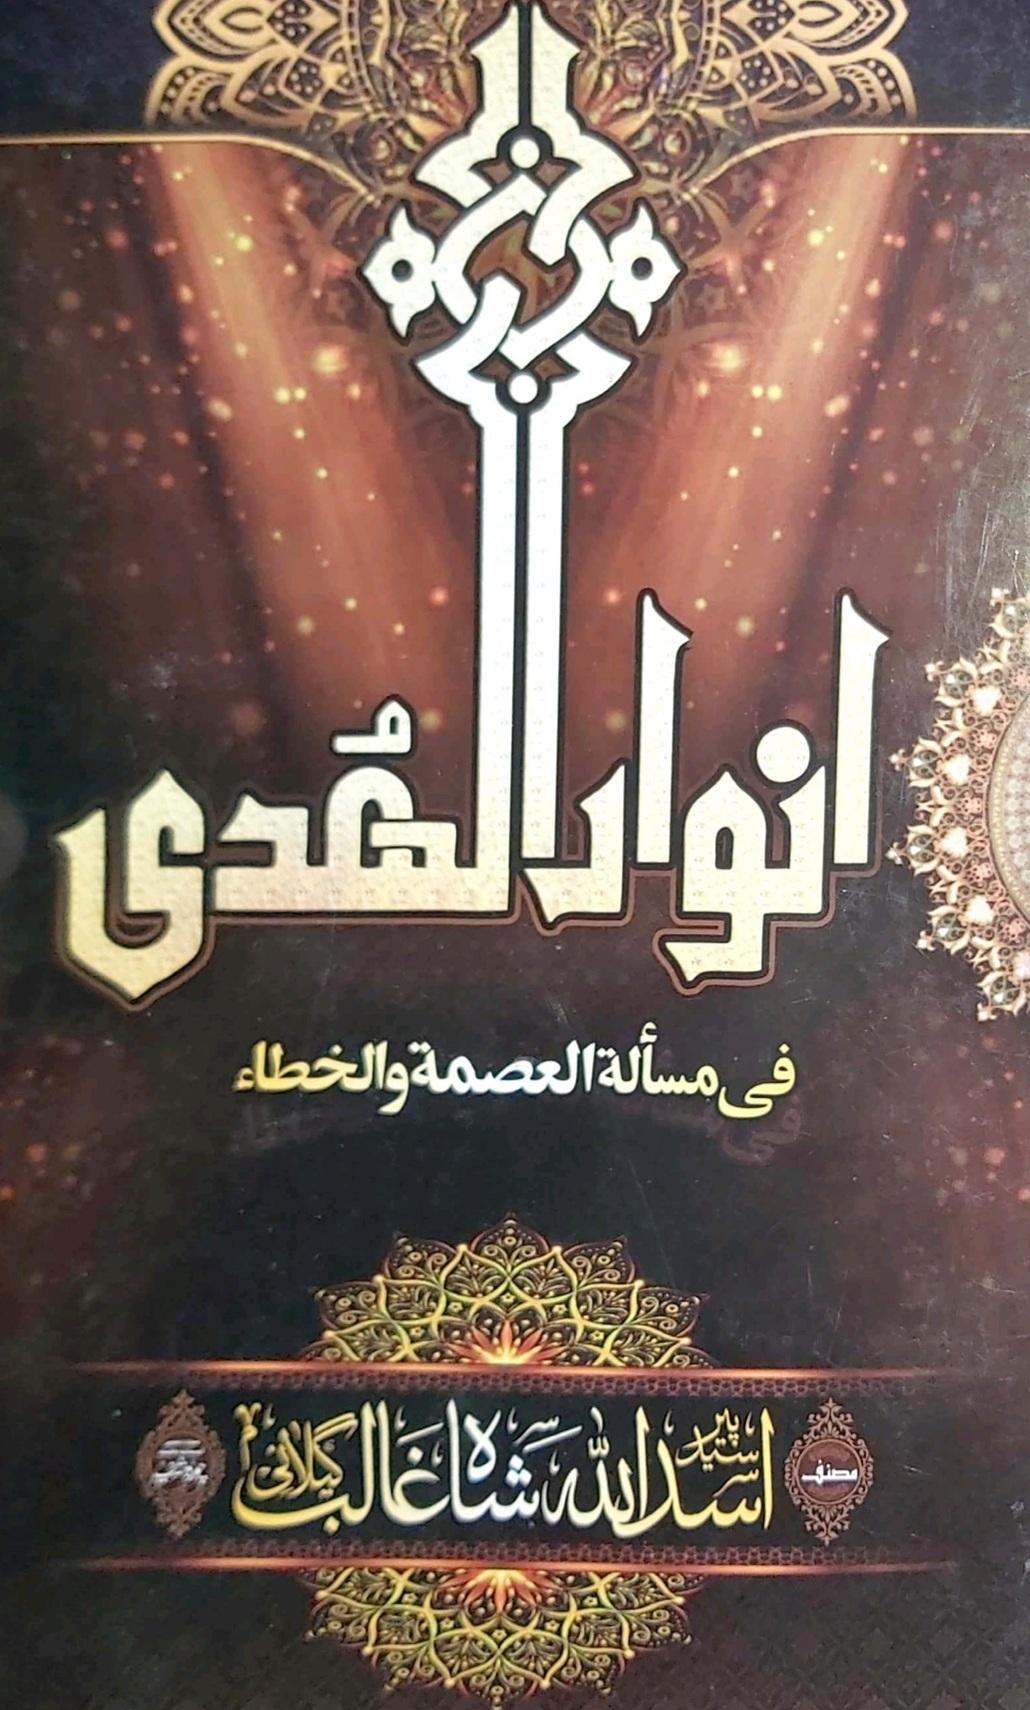 Anwaar Ul Huda / انوار الھدیٰ فی مسالۃ العصمۃ والخطاءby مولانا پیر سید اسد اللہ شاہ غالب